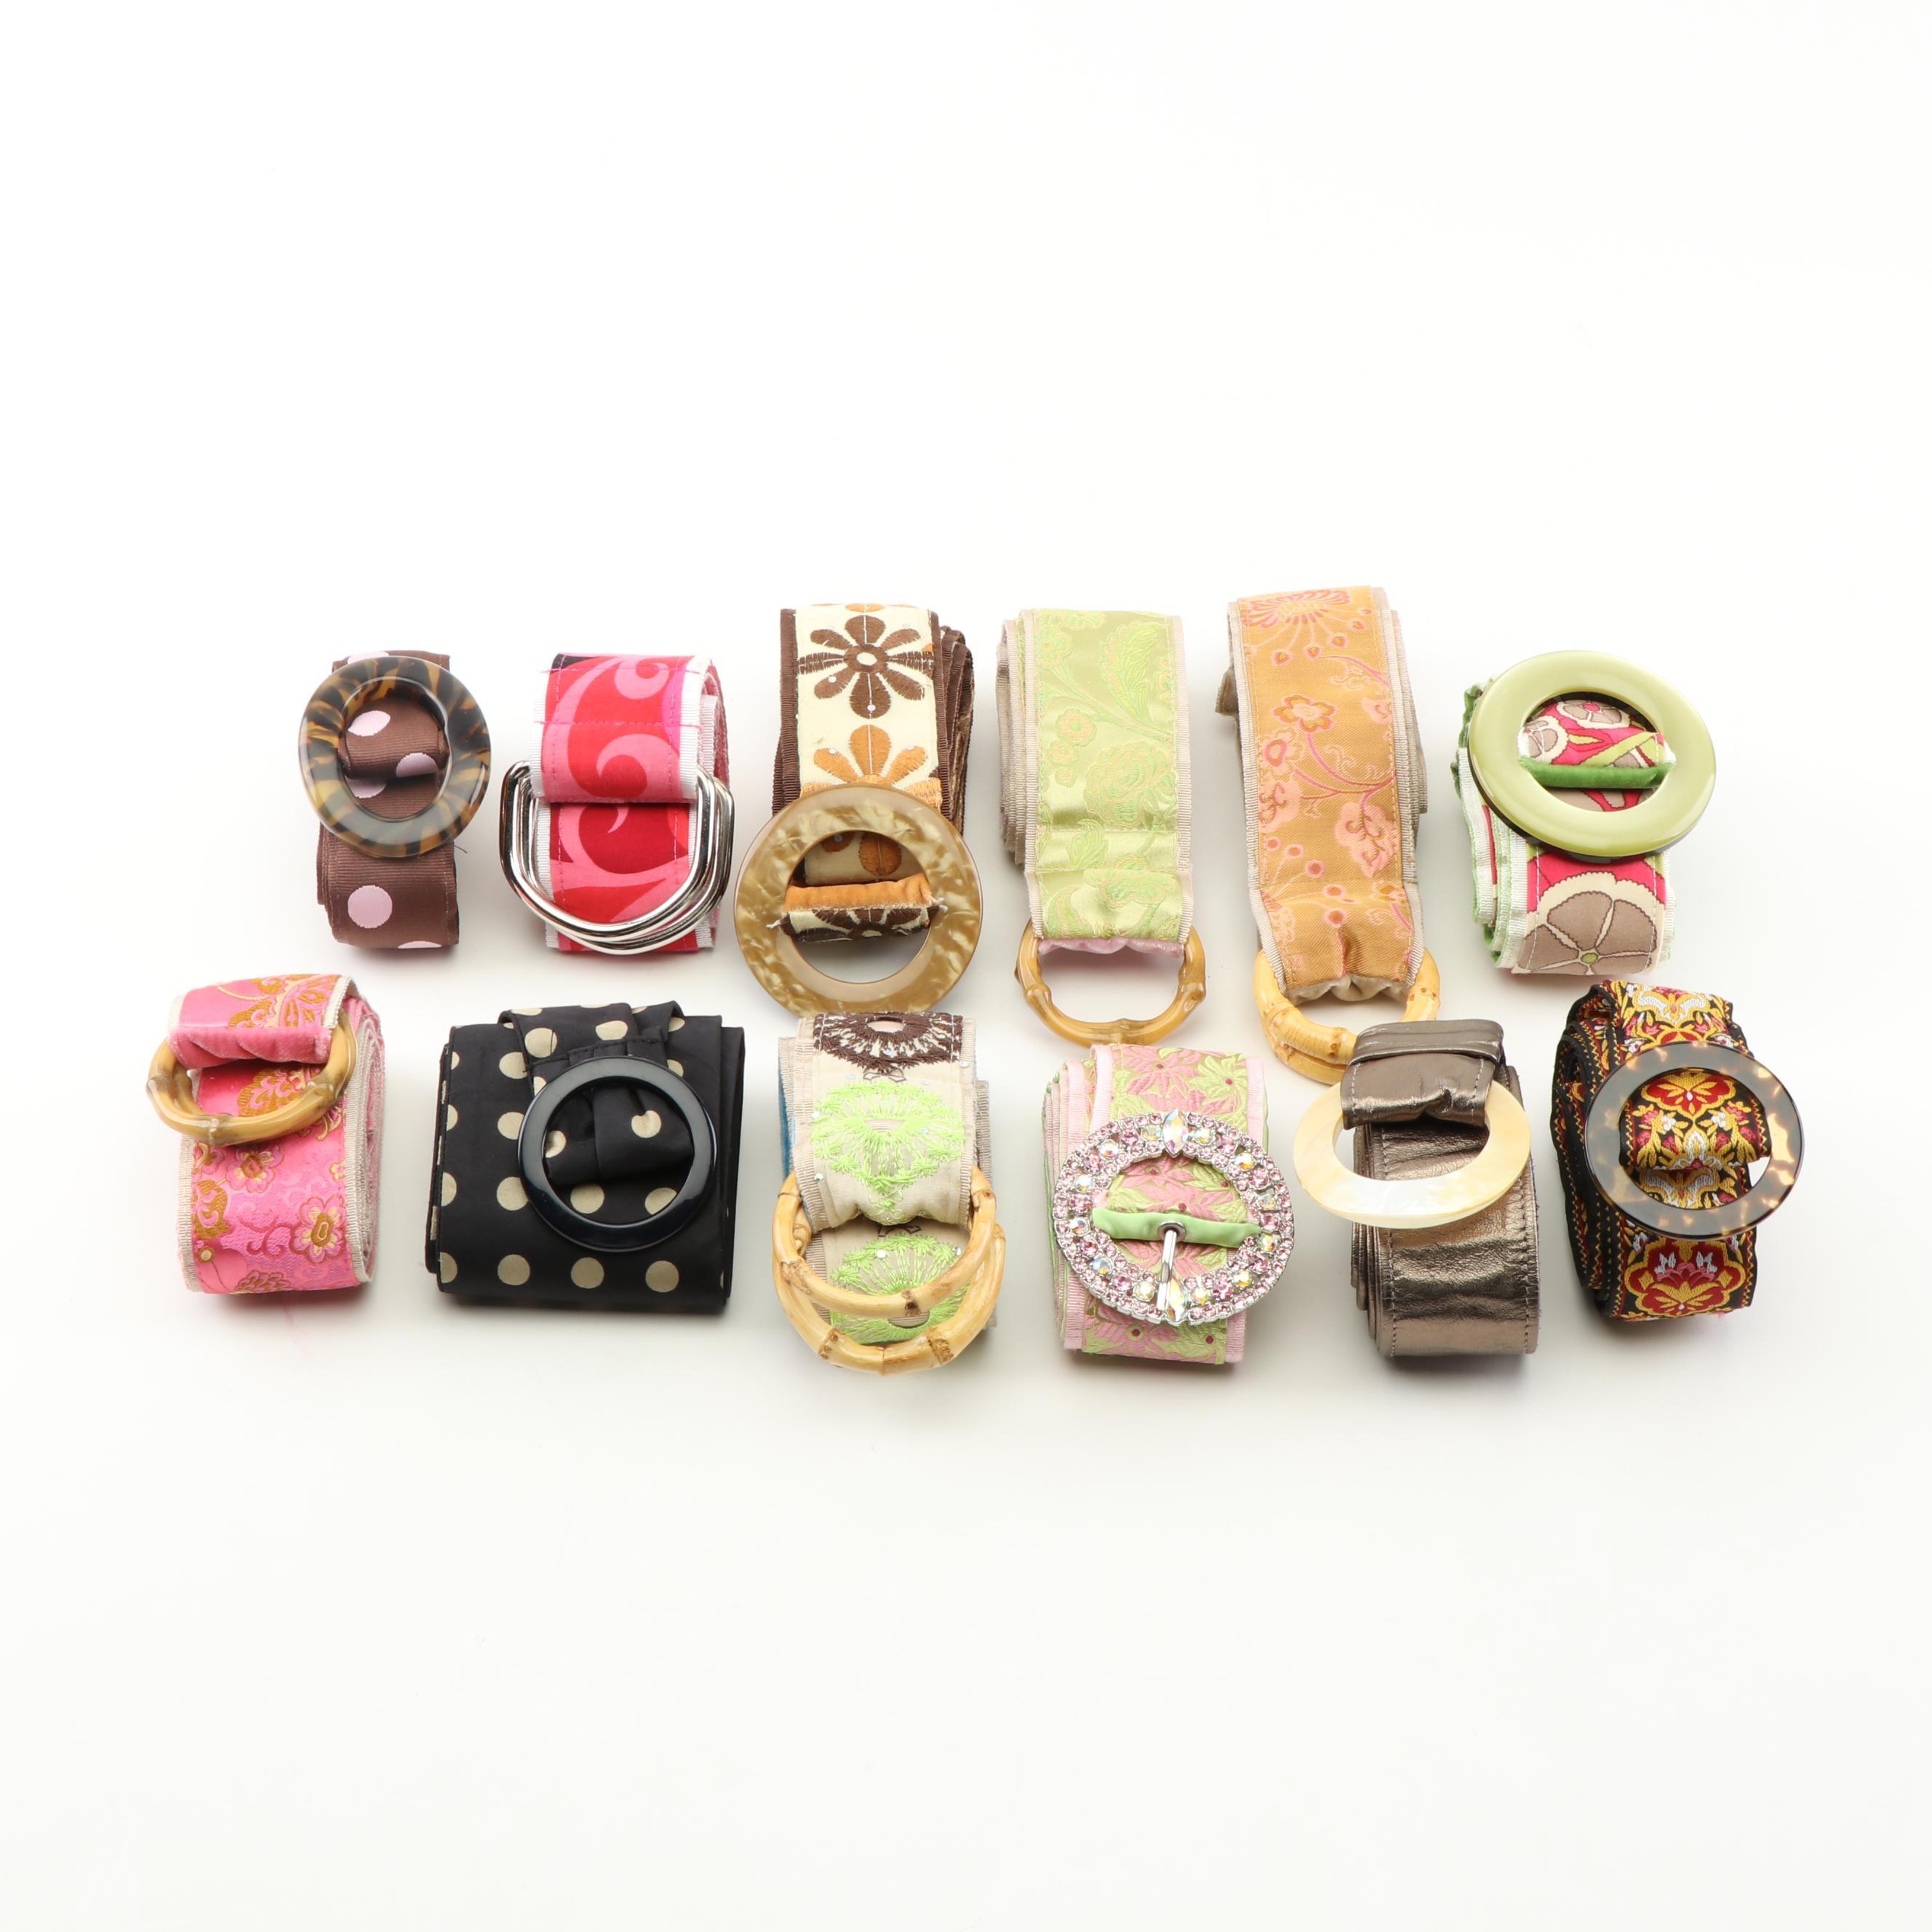 Twelve Fabric Belts Including Wink, Punch USA, and Loop de Loops